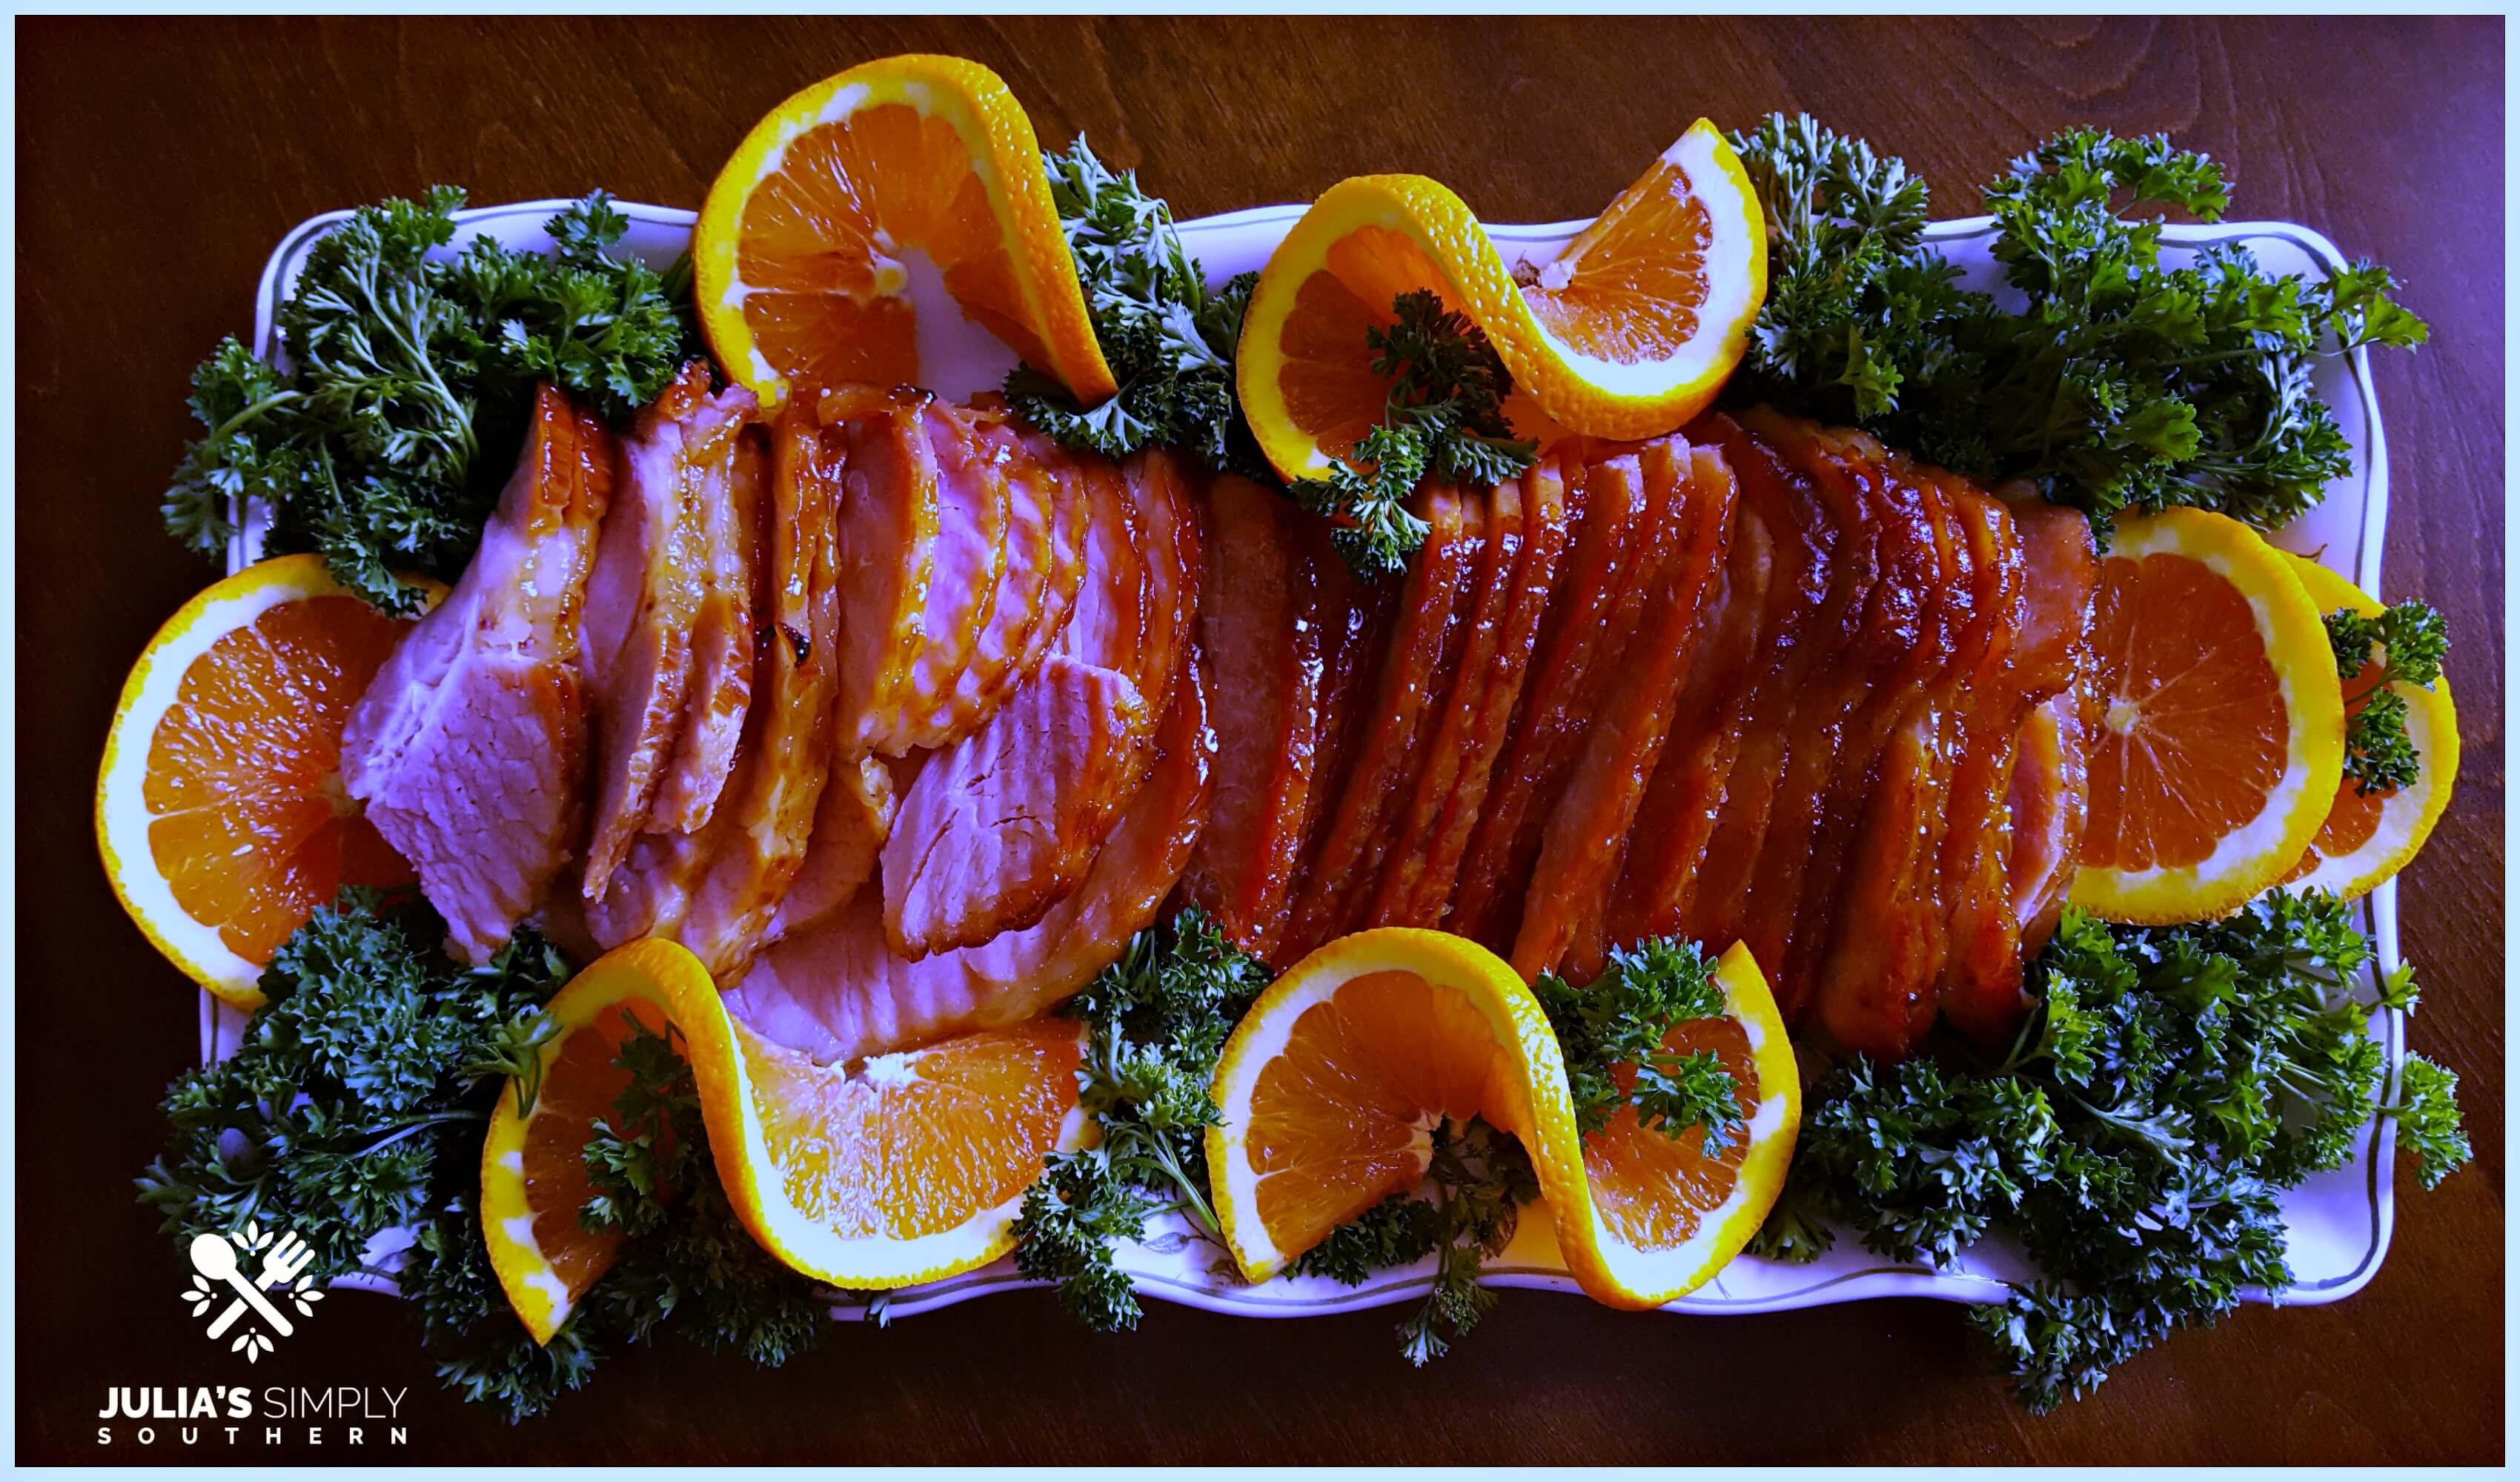 Glazed Ham Recipe for Glazed Ham with a Honey Orange Glaze on a serving platter garnished with orange slices and parsley